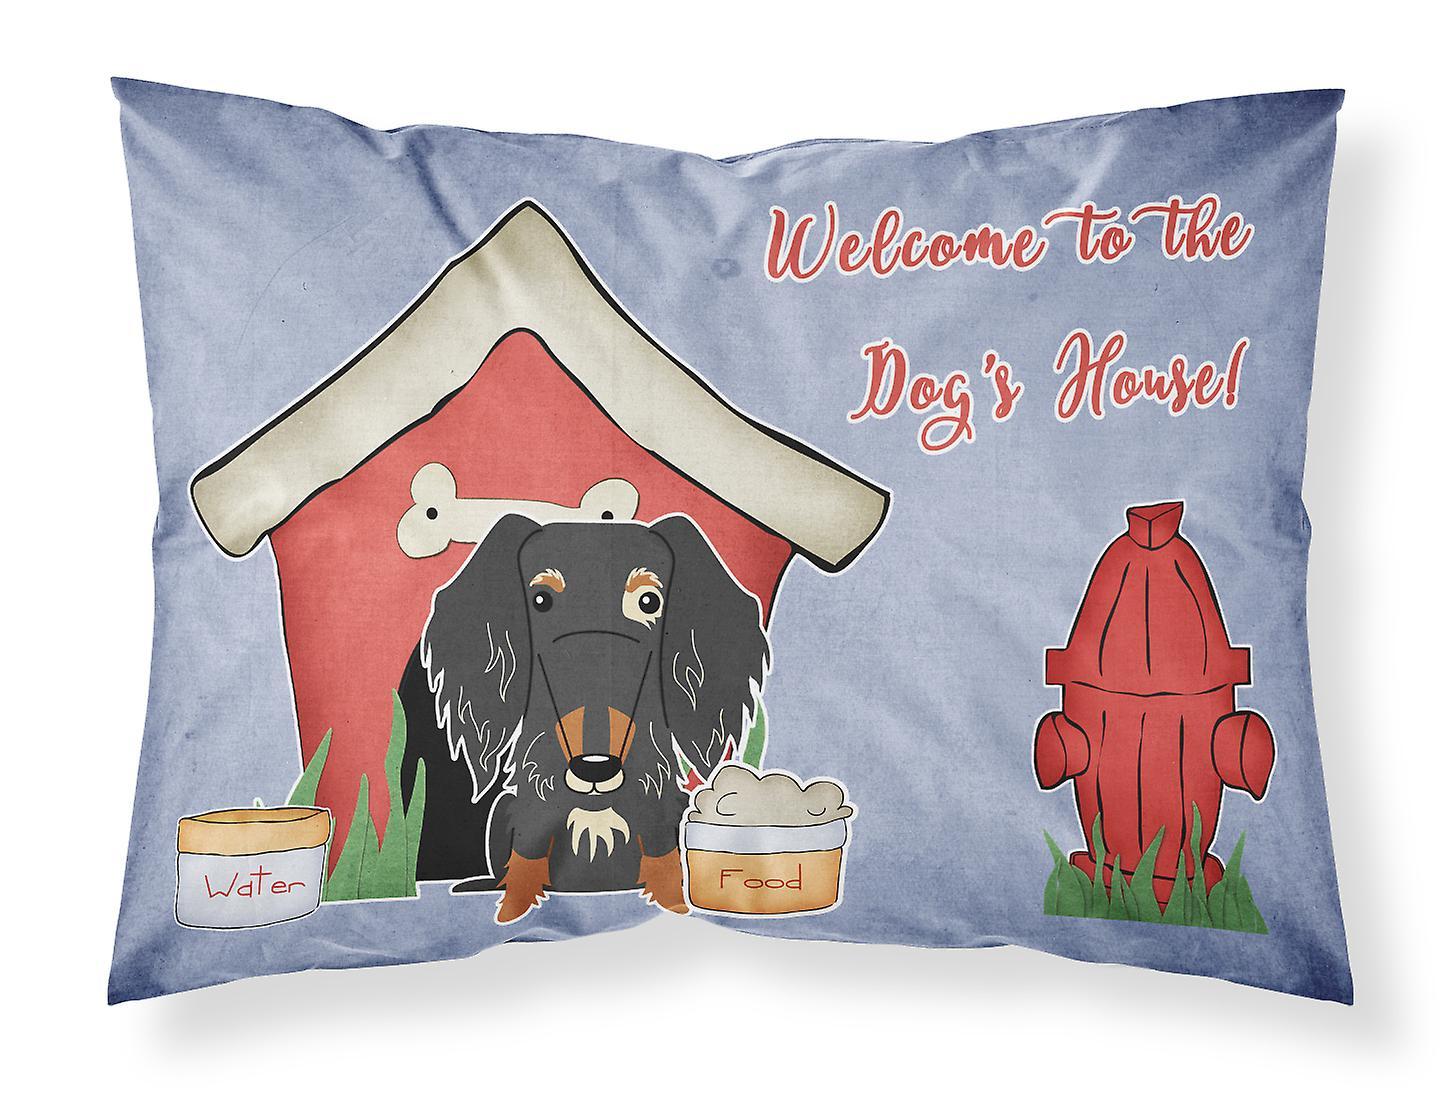 House Teckel D'oreiller Collection Poil Dog Standard Tissu Fil Tigre Taie LqzMVpGSU